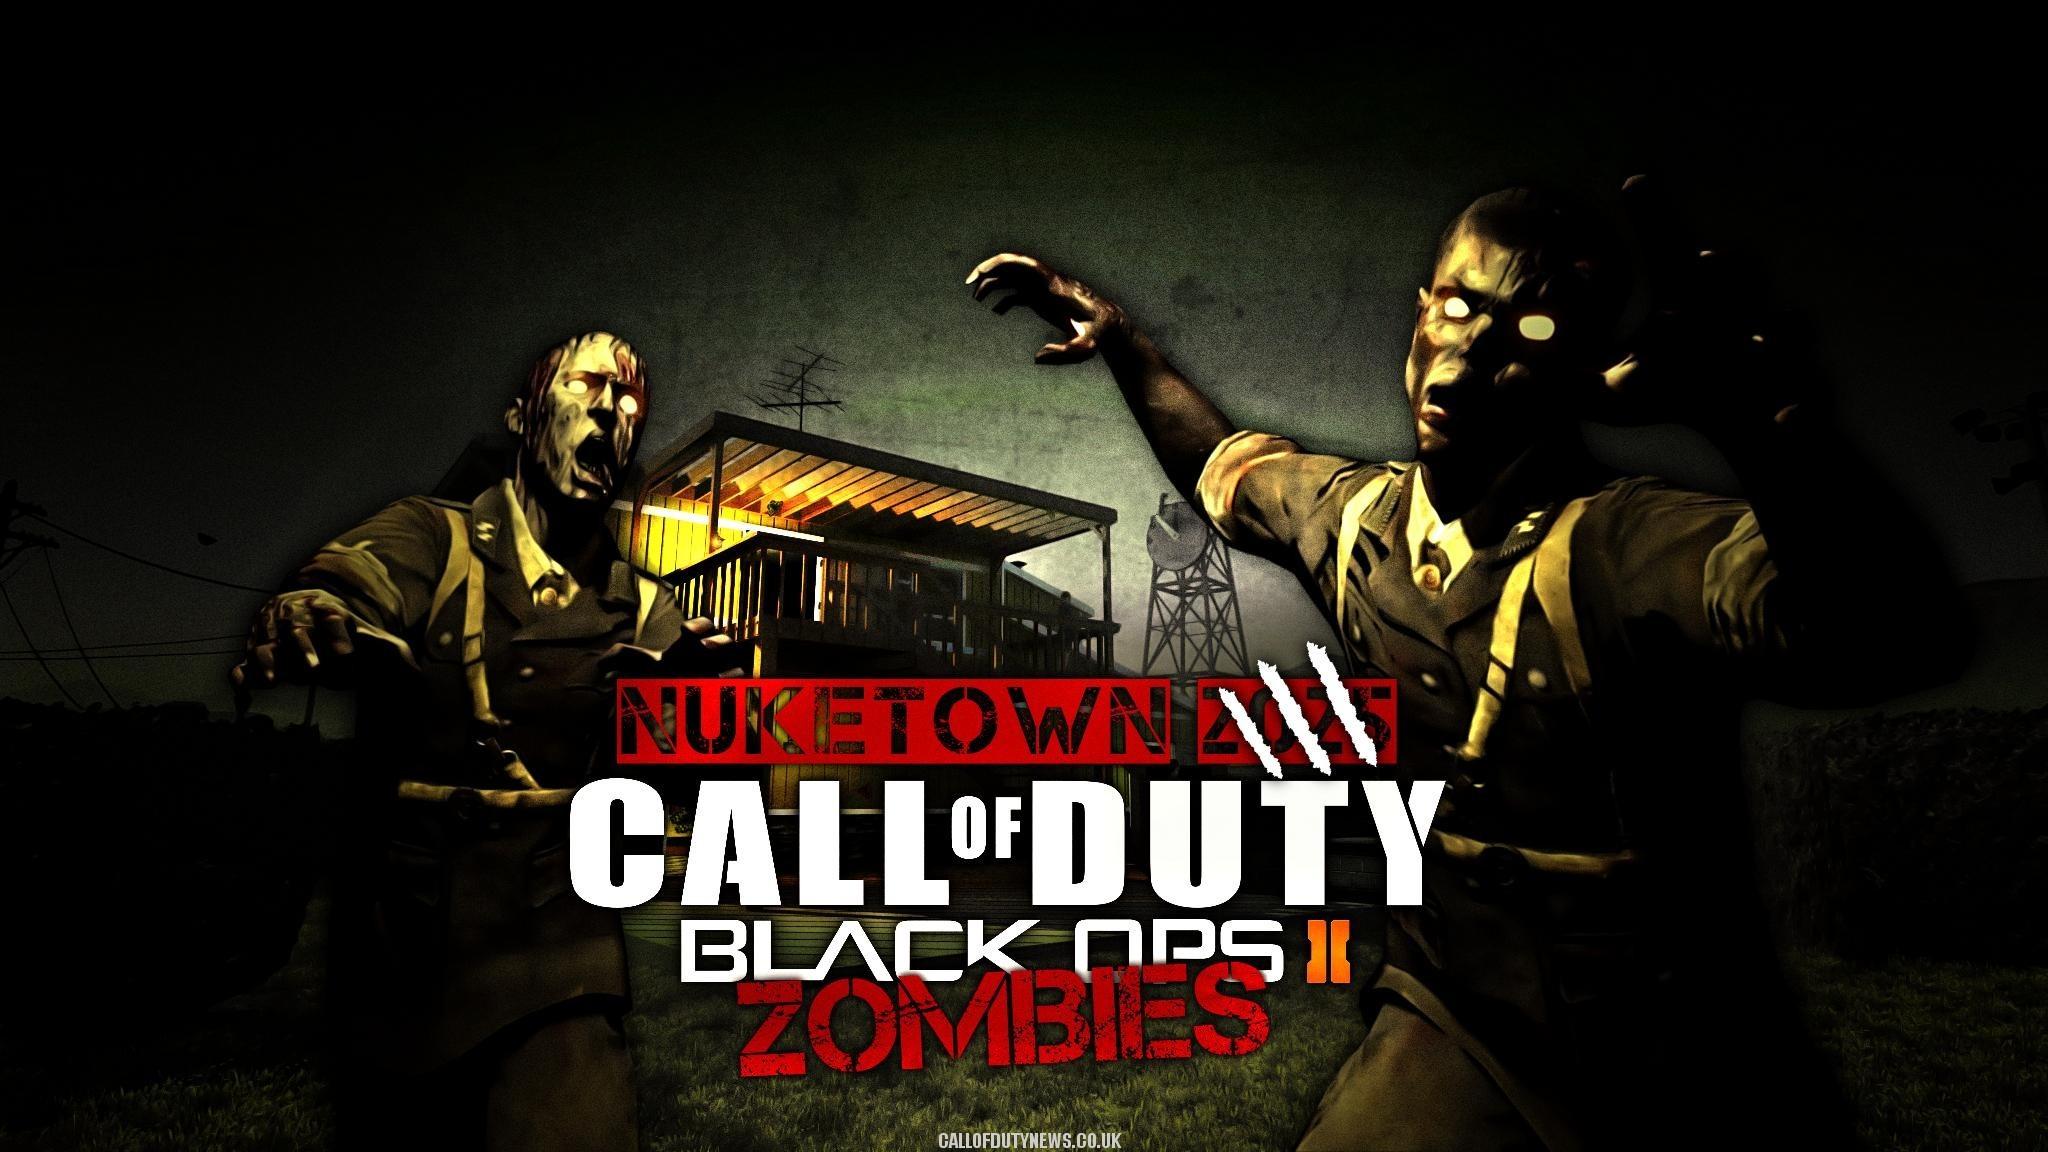 Call of Duty Black Ops 2 Zombie HD Wallpaper #944